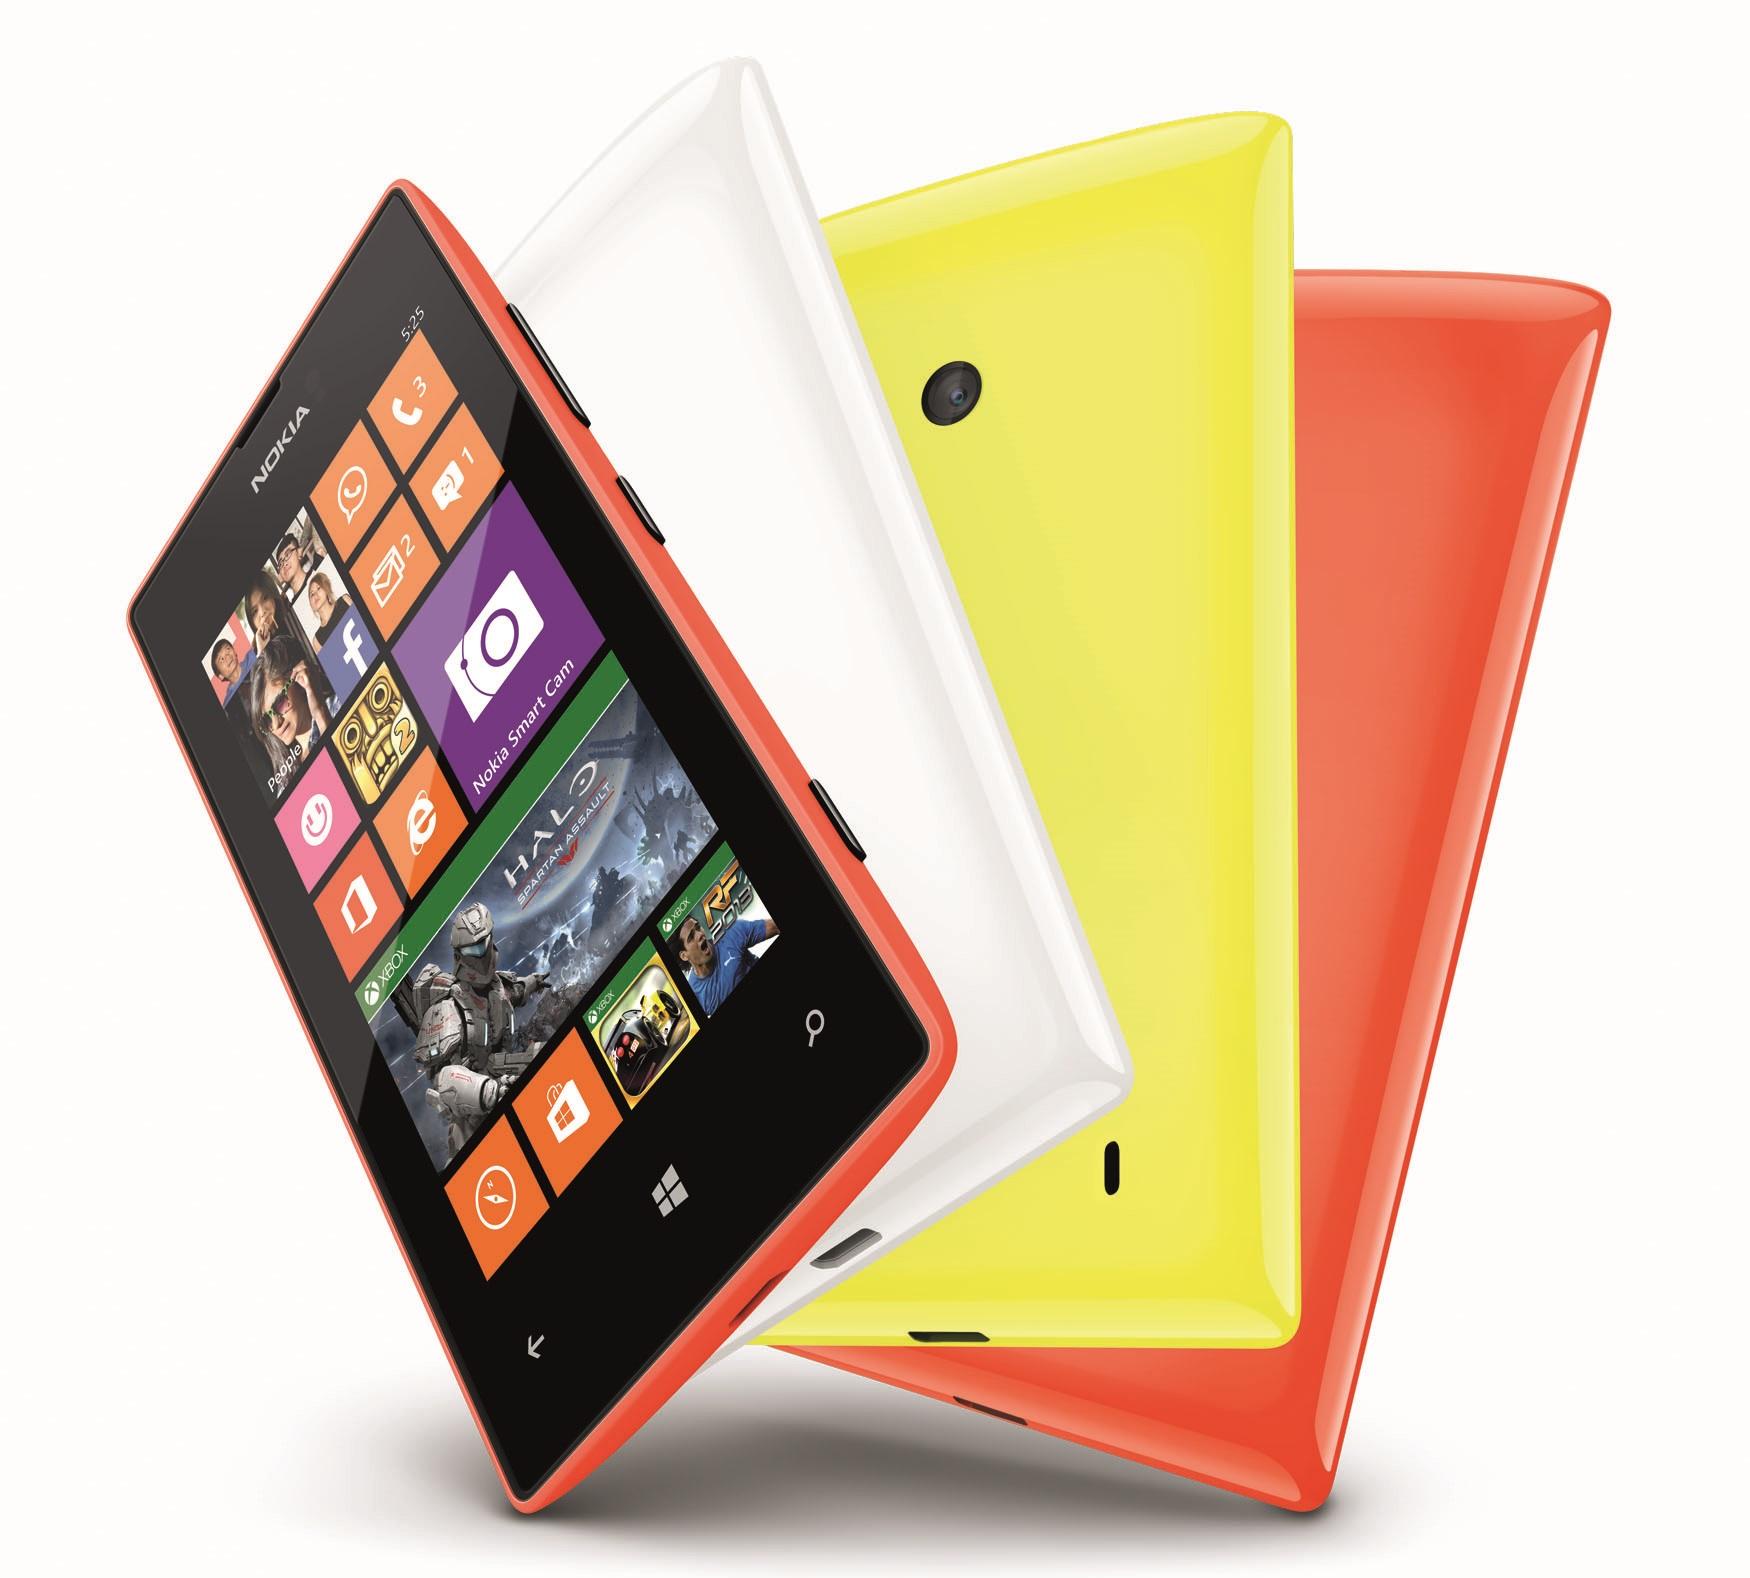 Nokia Lumia 525 image 3